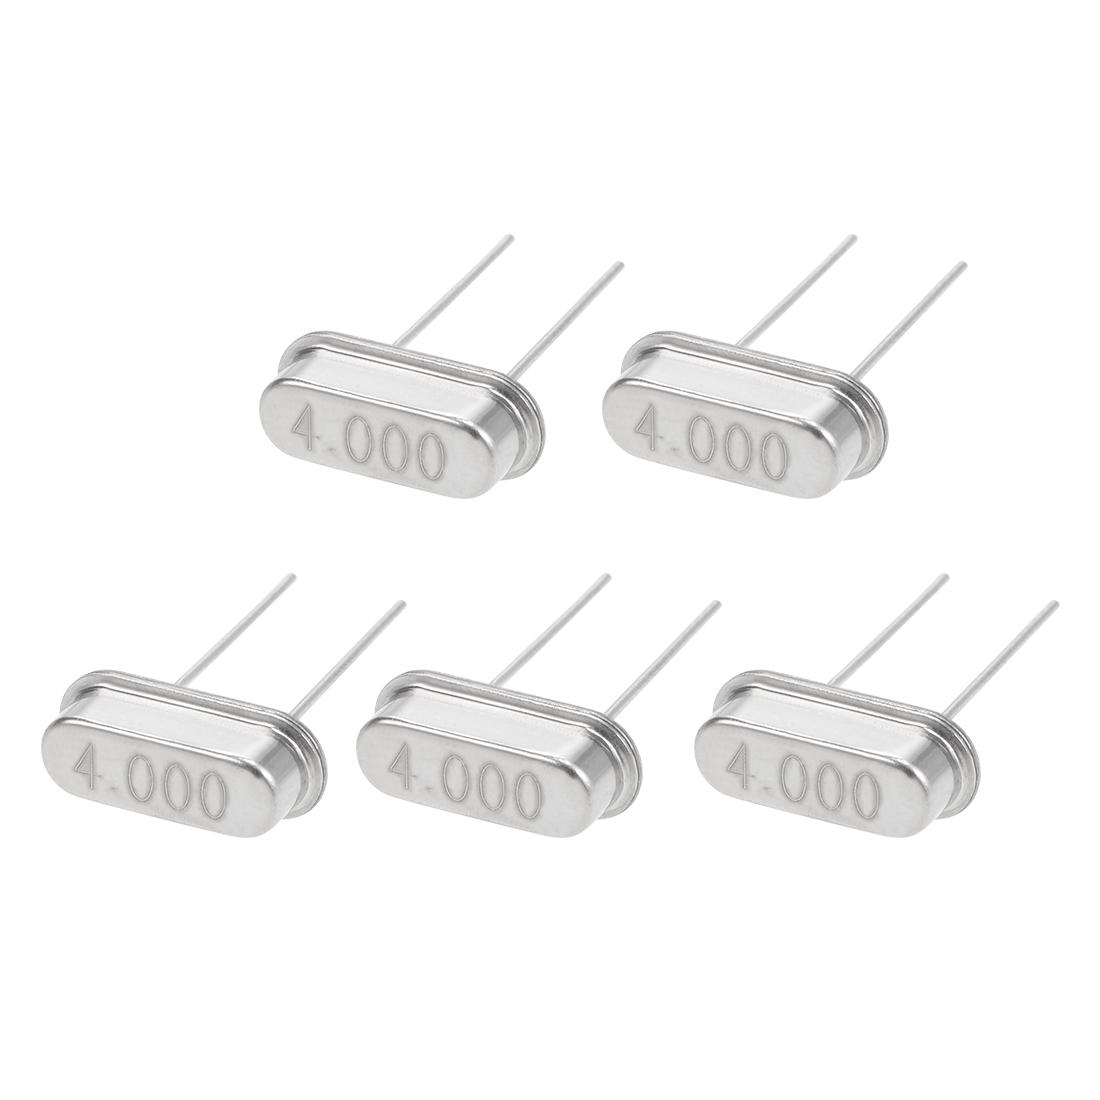 5pcs 4MHz HC-49S DIP Quartz Crystal Oscillator Resonator Replacement